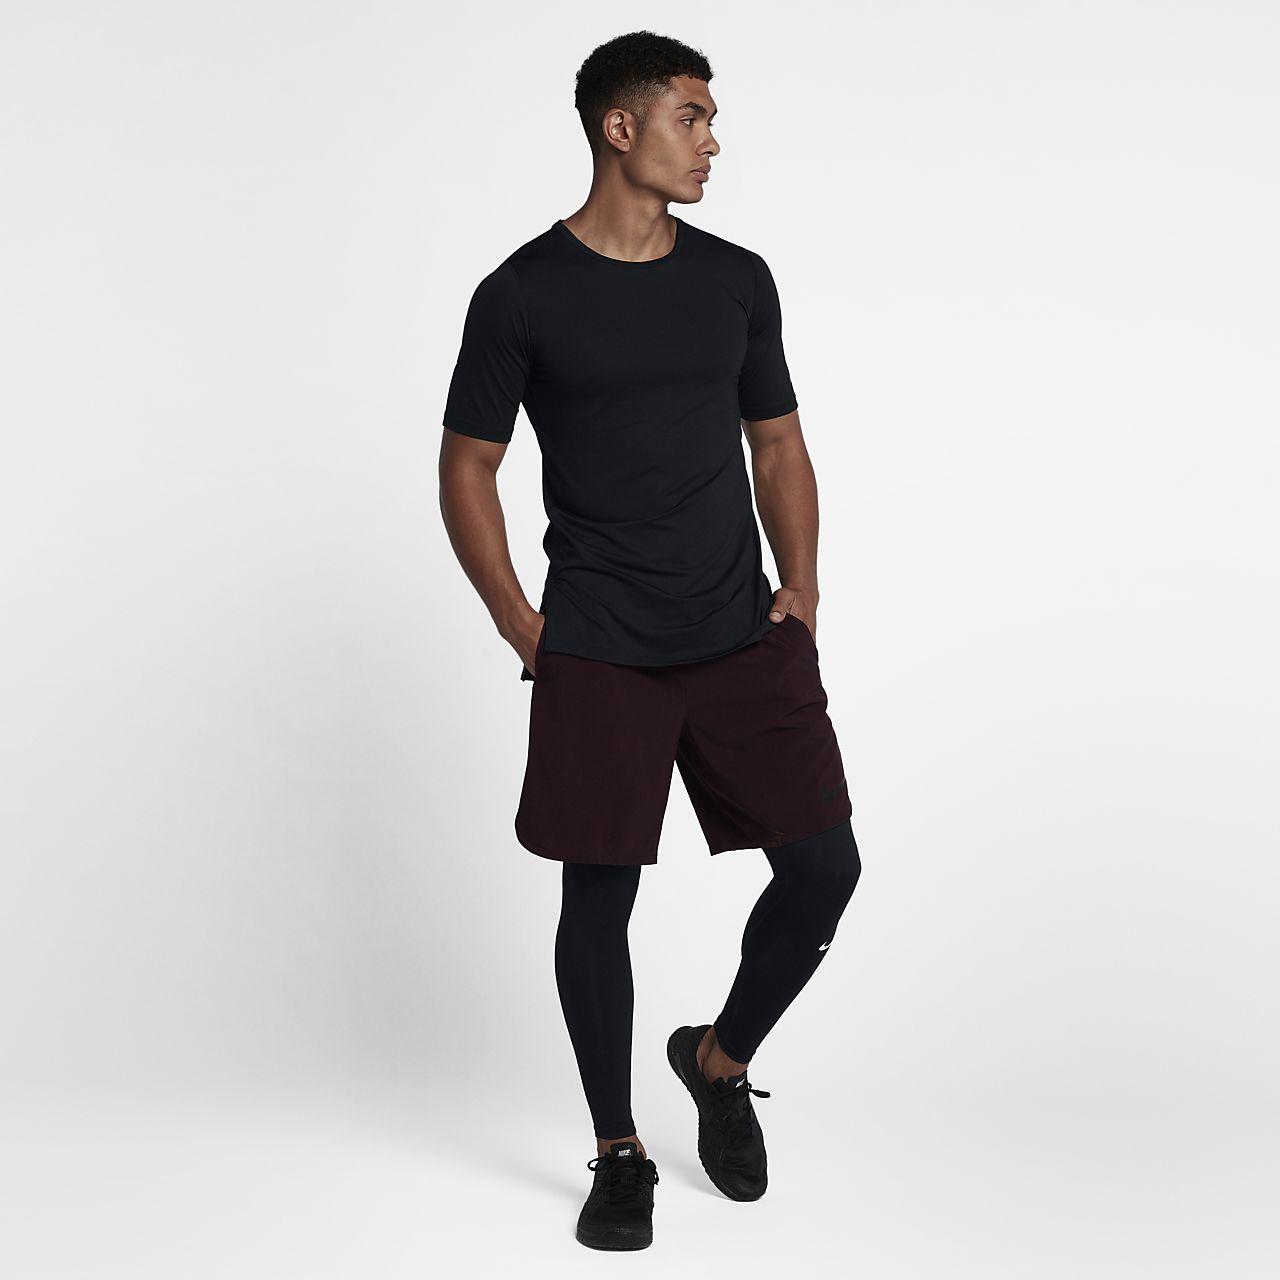 Asics Sweat Ben Longsleeve Running Top Tee Gym Shirt Sports Top 50% OFF Activewear Tops